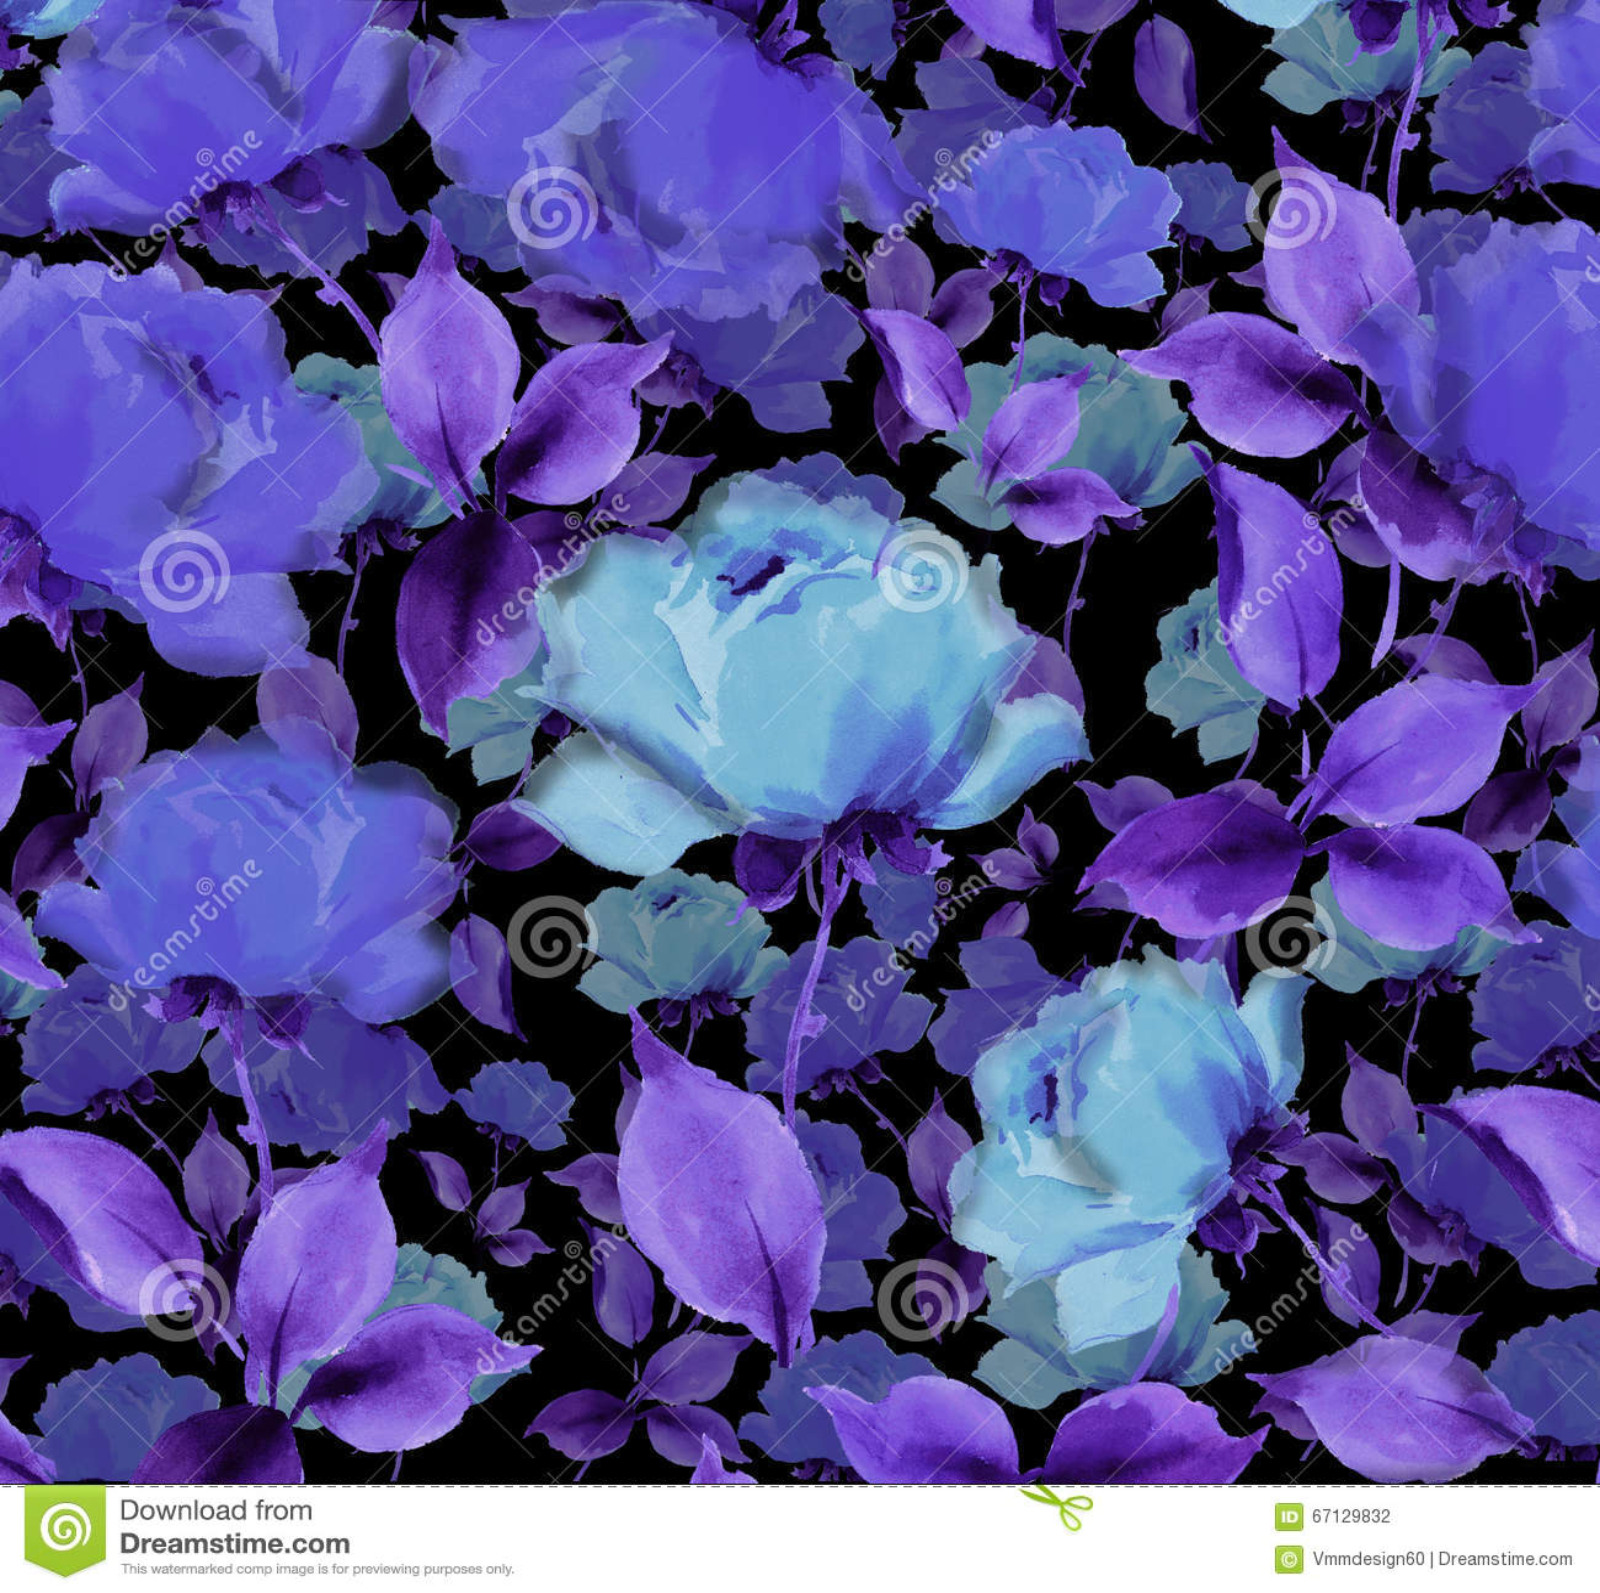 Flowers Blue Velvet Watercolor Oil Painting Textured